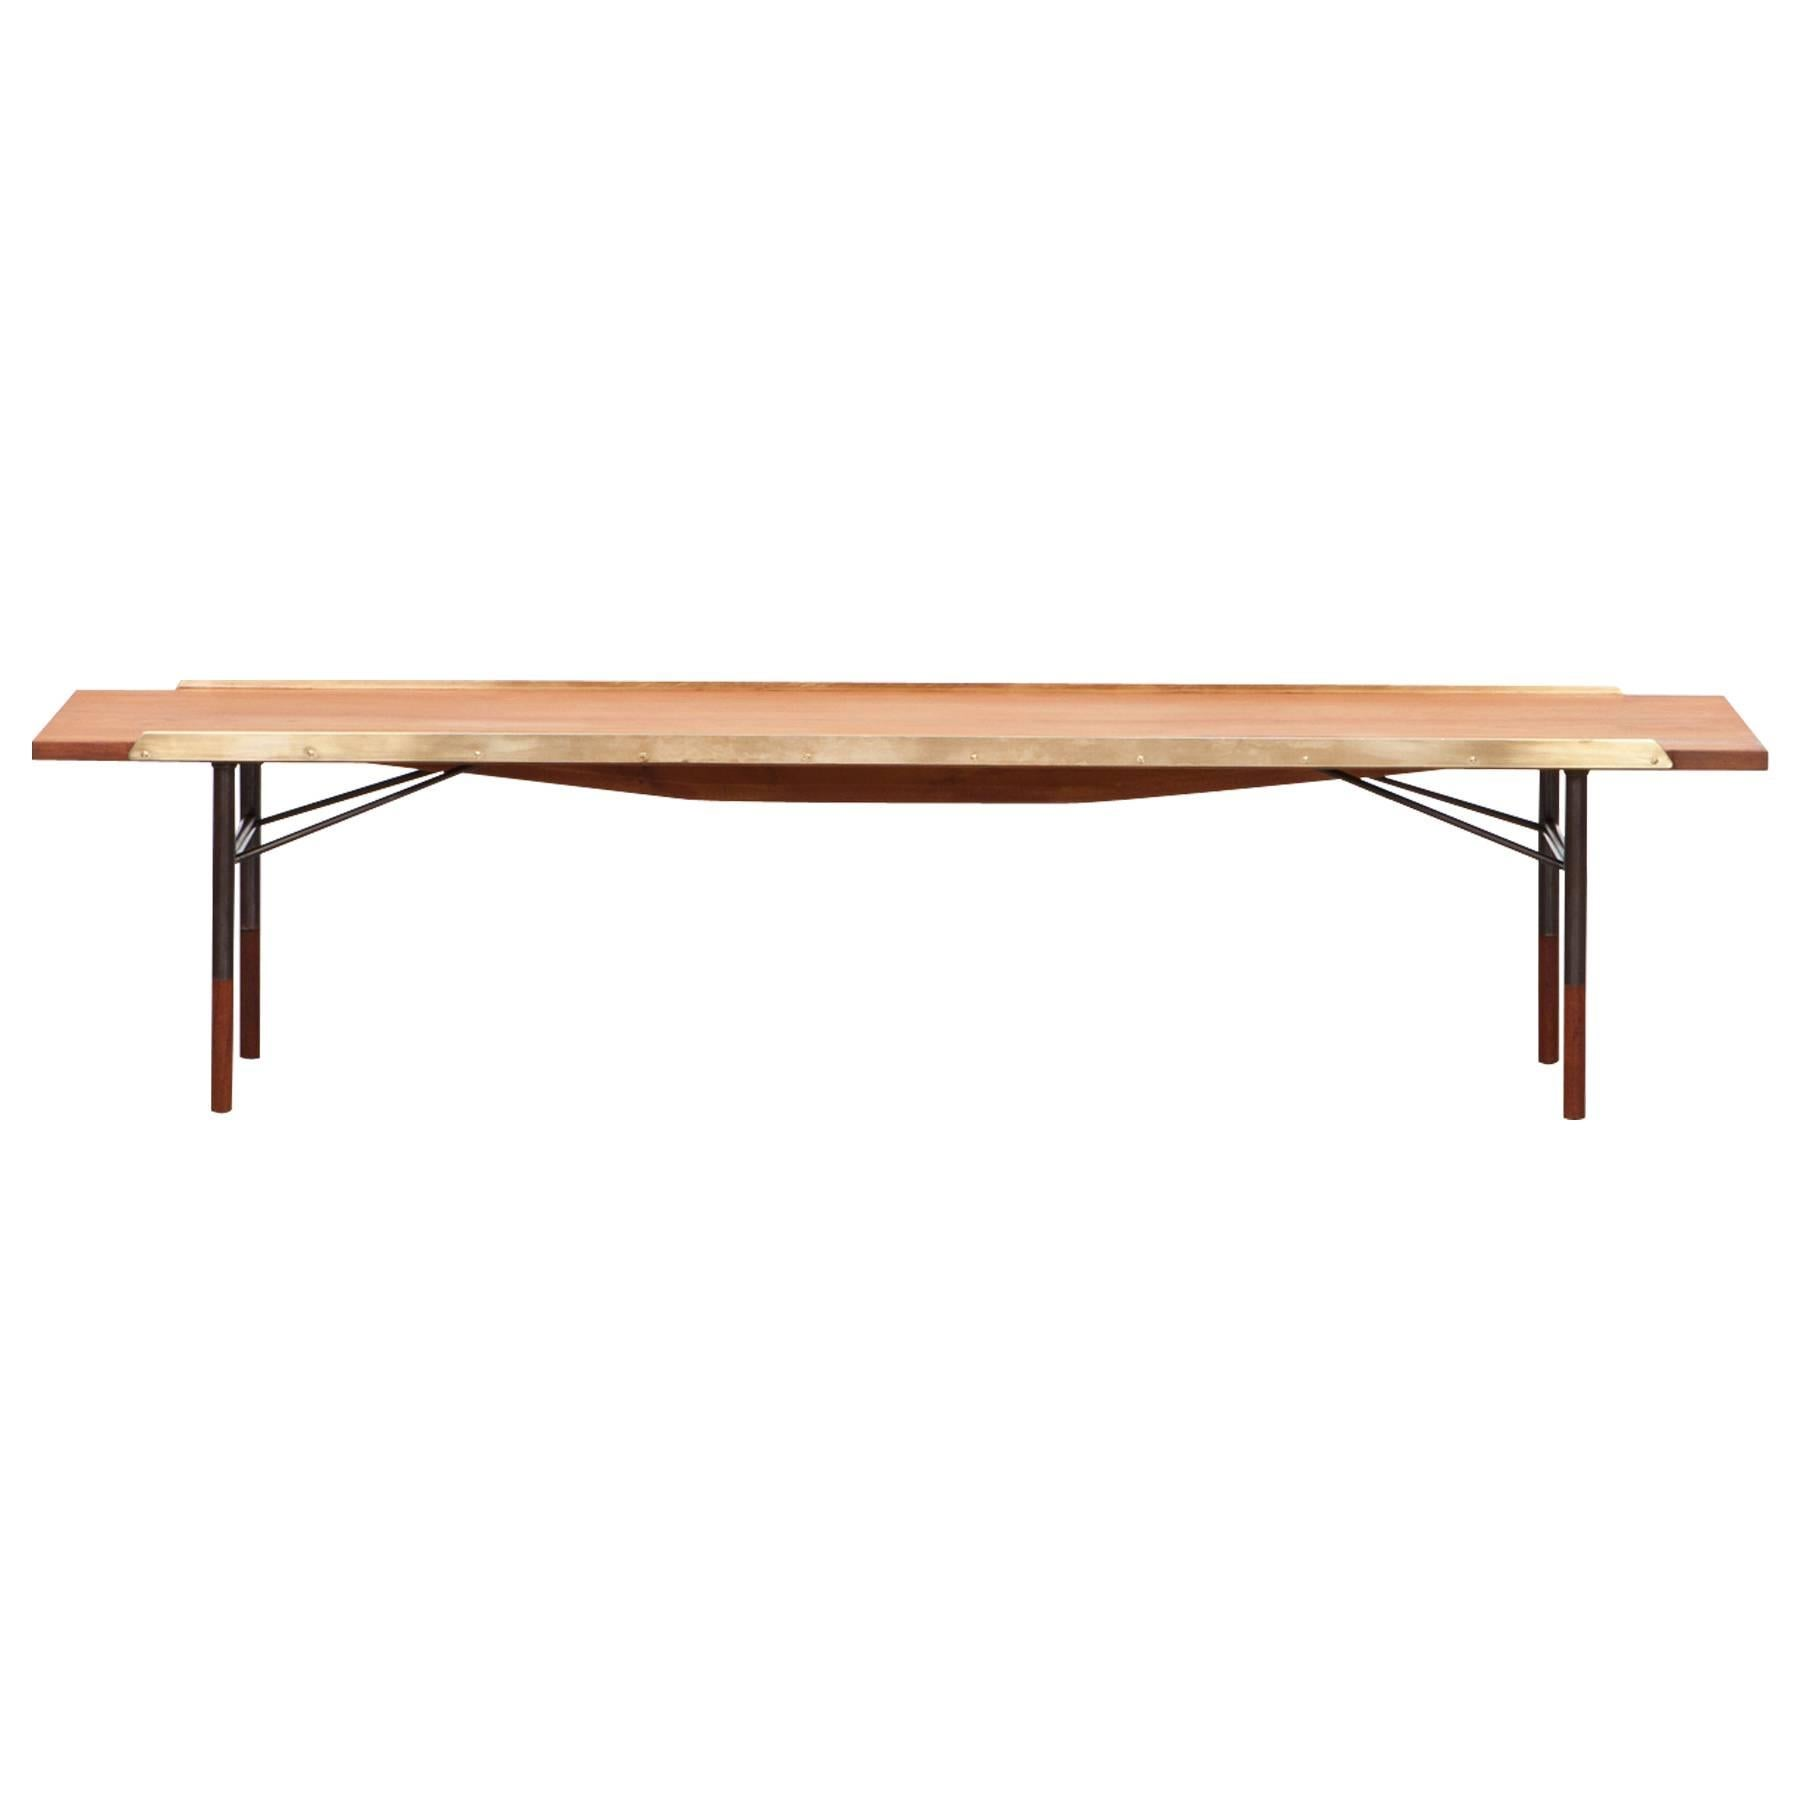 Finn Juhl Coffee Table or Bench